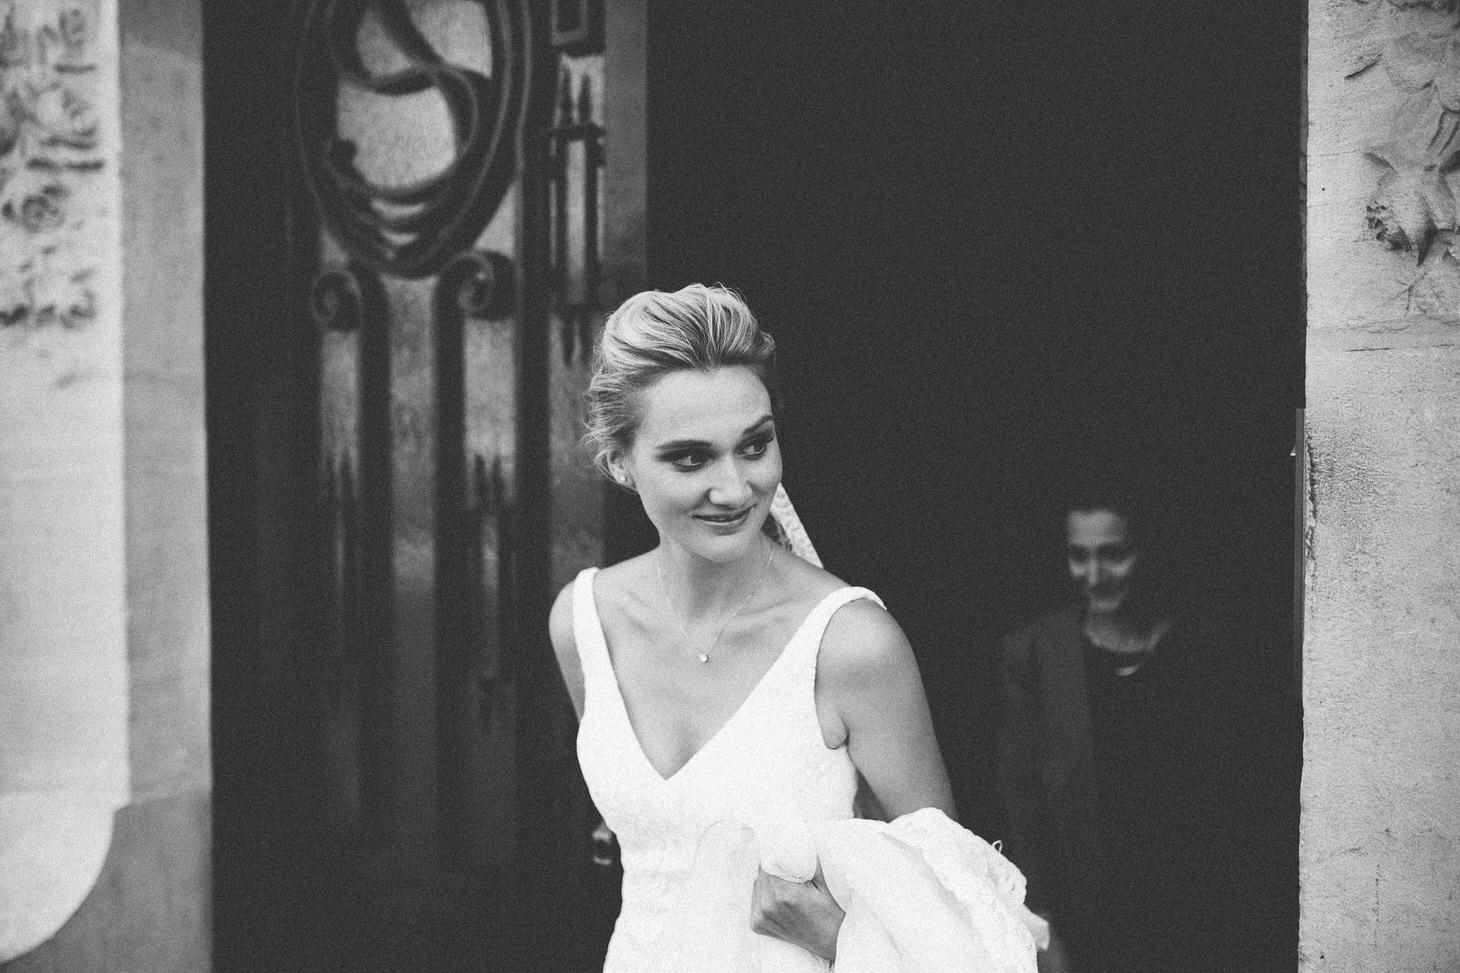 photographe-mariage-paris-montfort-l-amaury-022